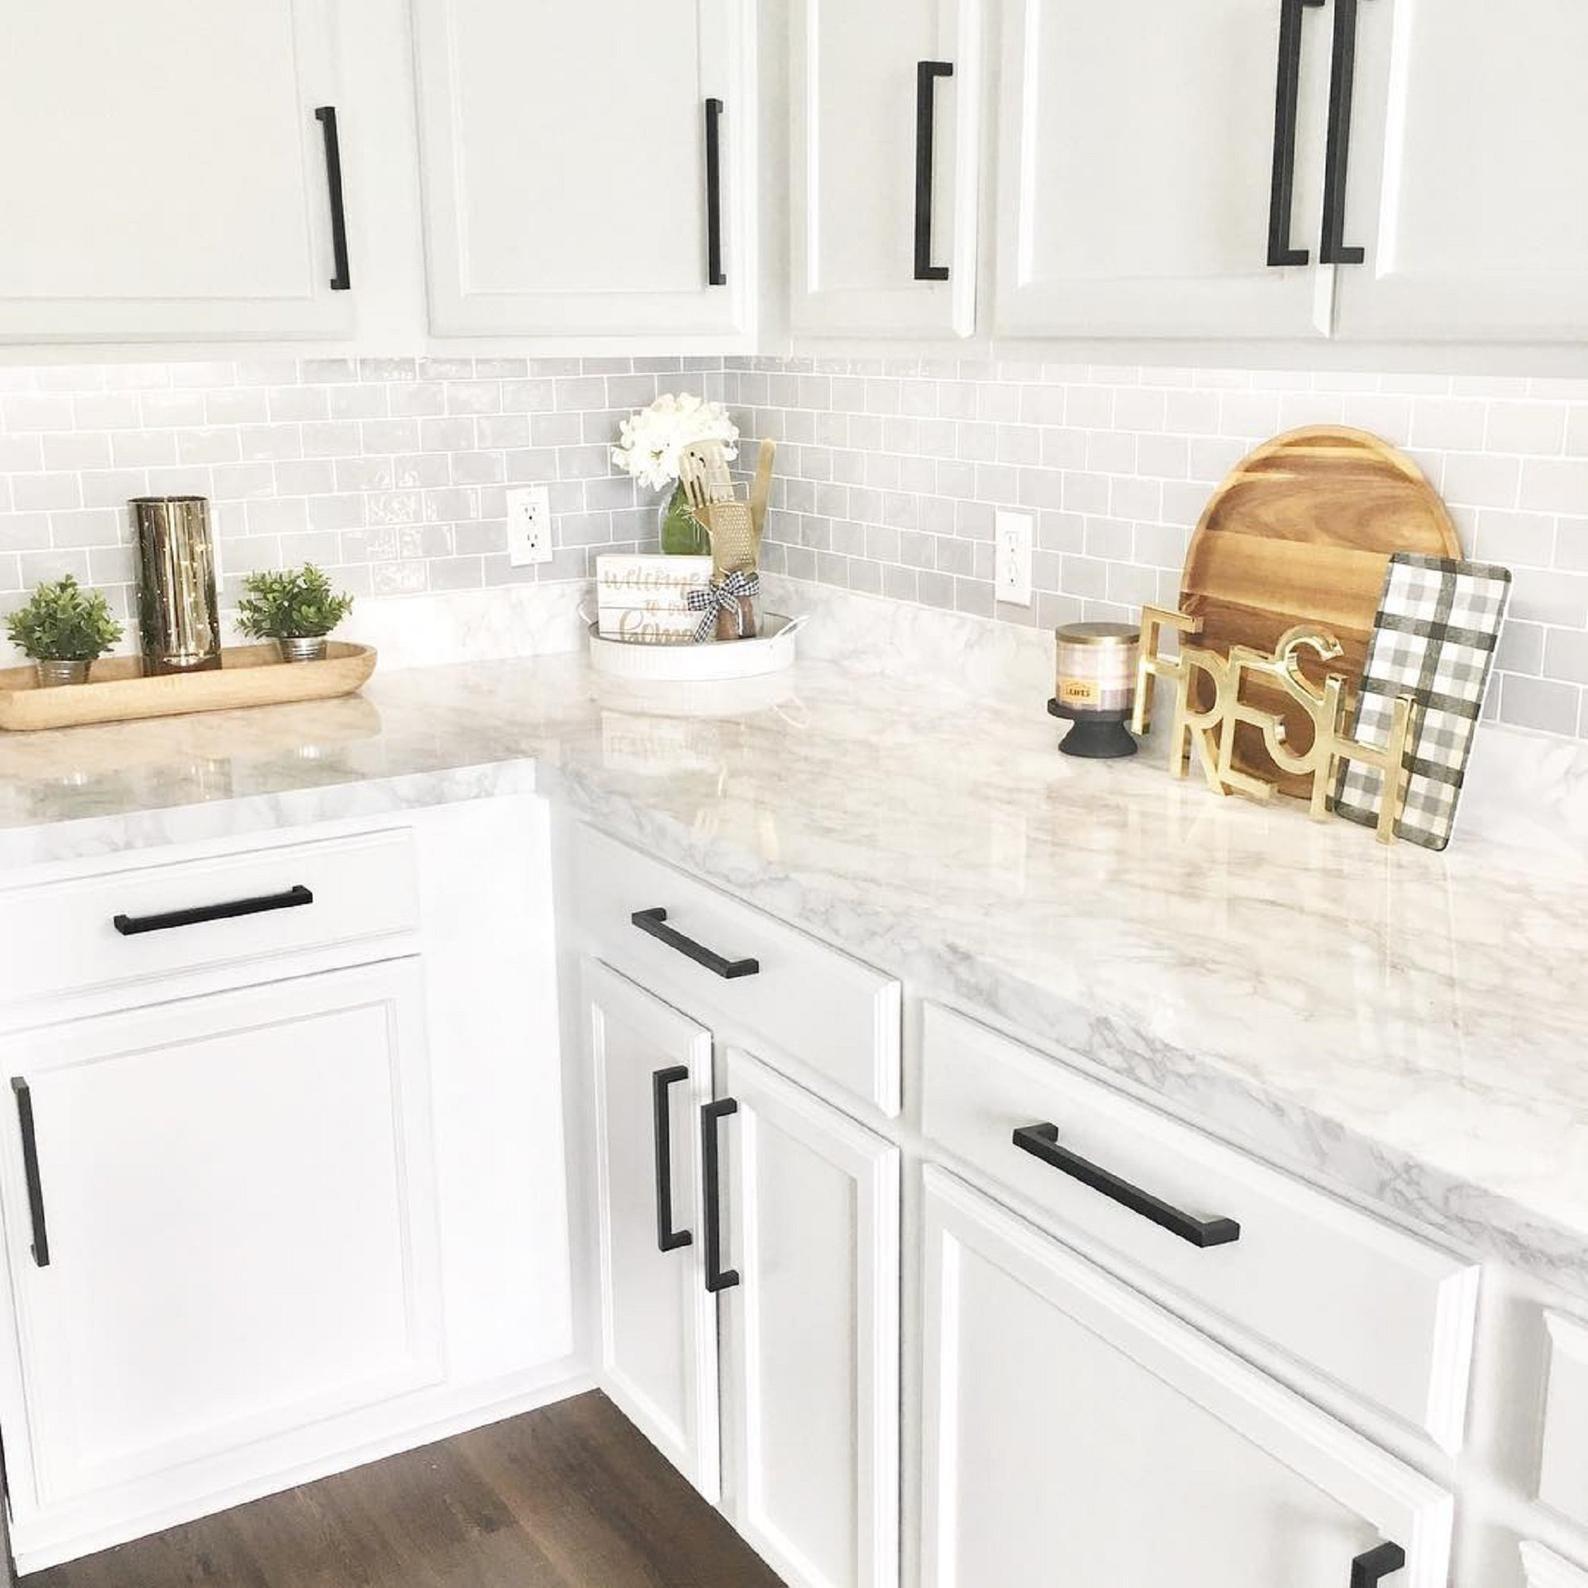 Ez Faux Decor Self Adhesive Decorative Peel And Stick Countertops Marble No Paint In 2020 Countertop Decor Kitchen Remodel Kitchen Counter Decor